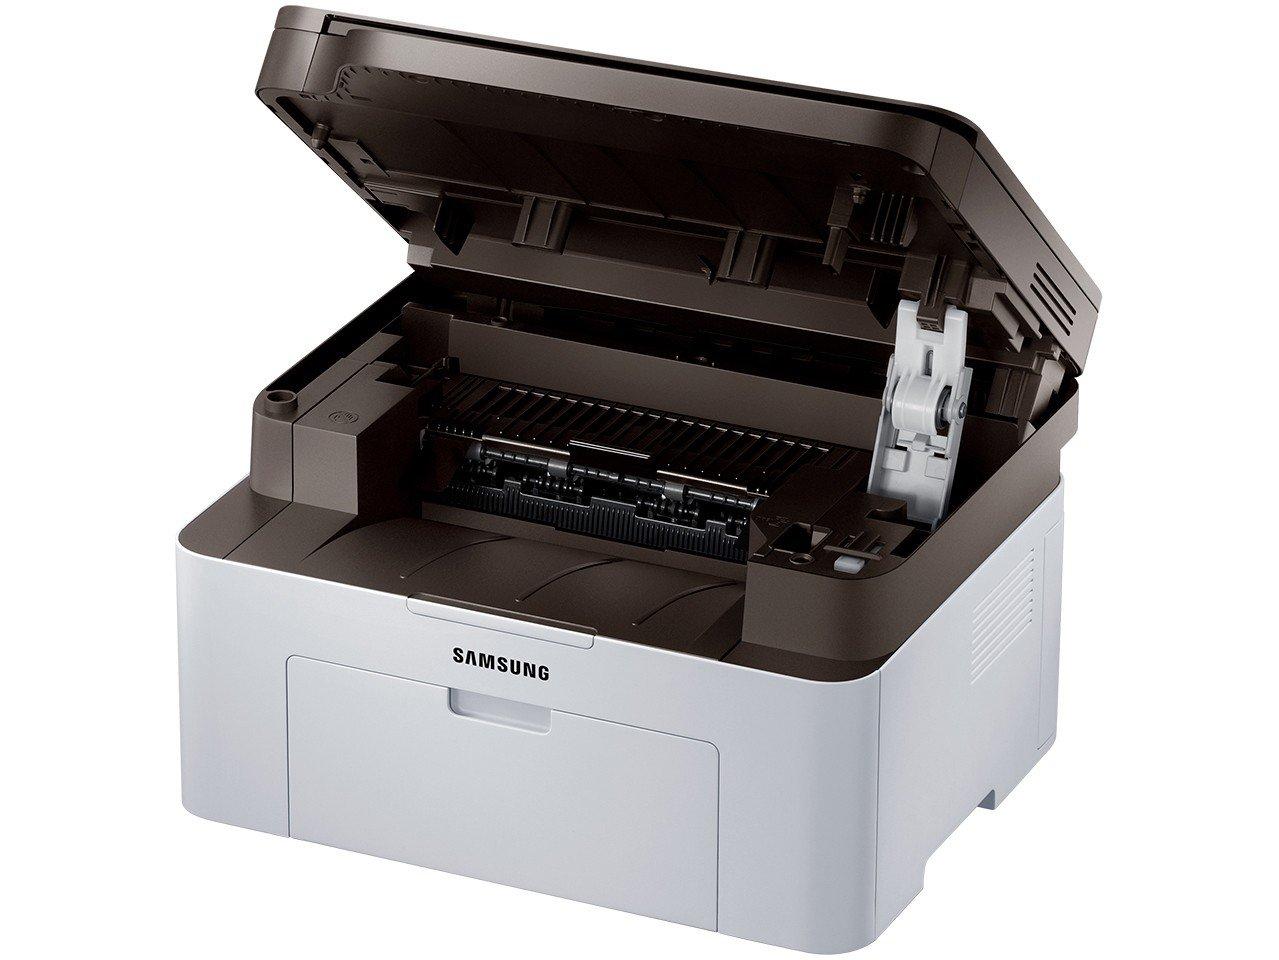 Foto 7 - Multifuncional Samsung Xpress M2070 - Monocromática Laser USB 2.0